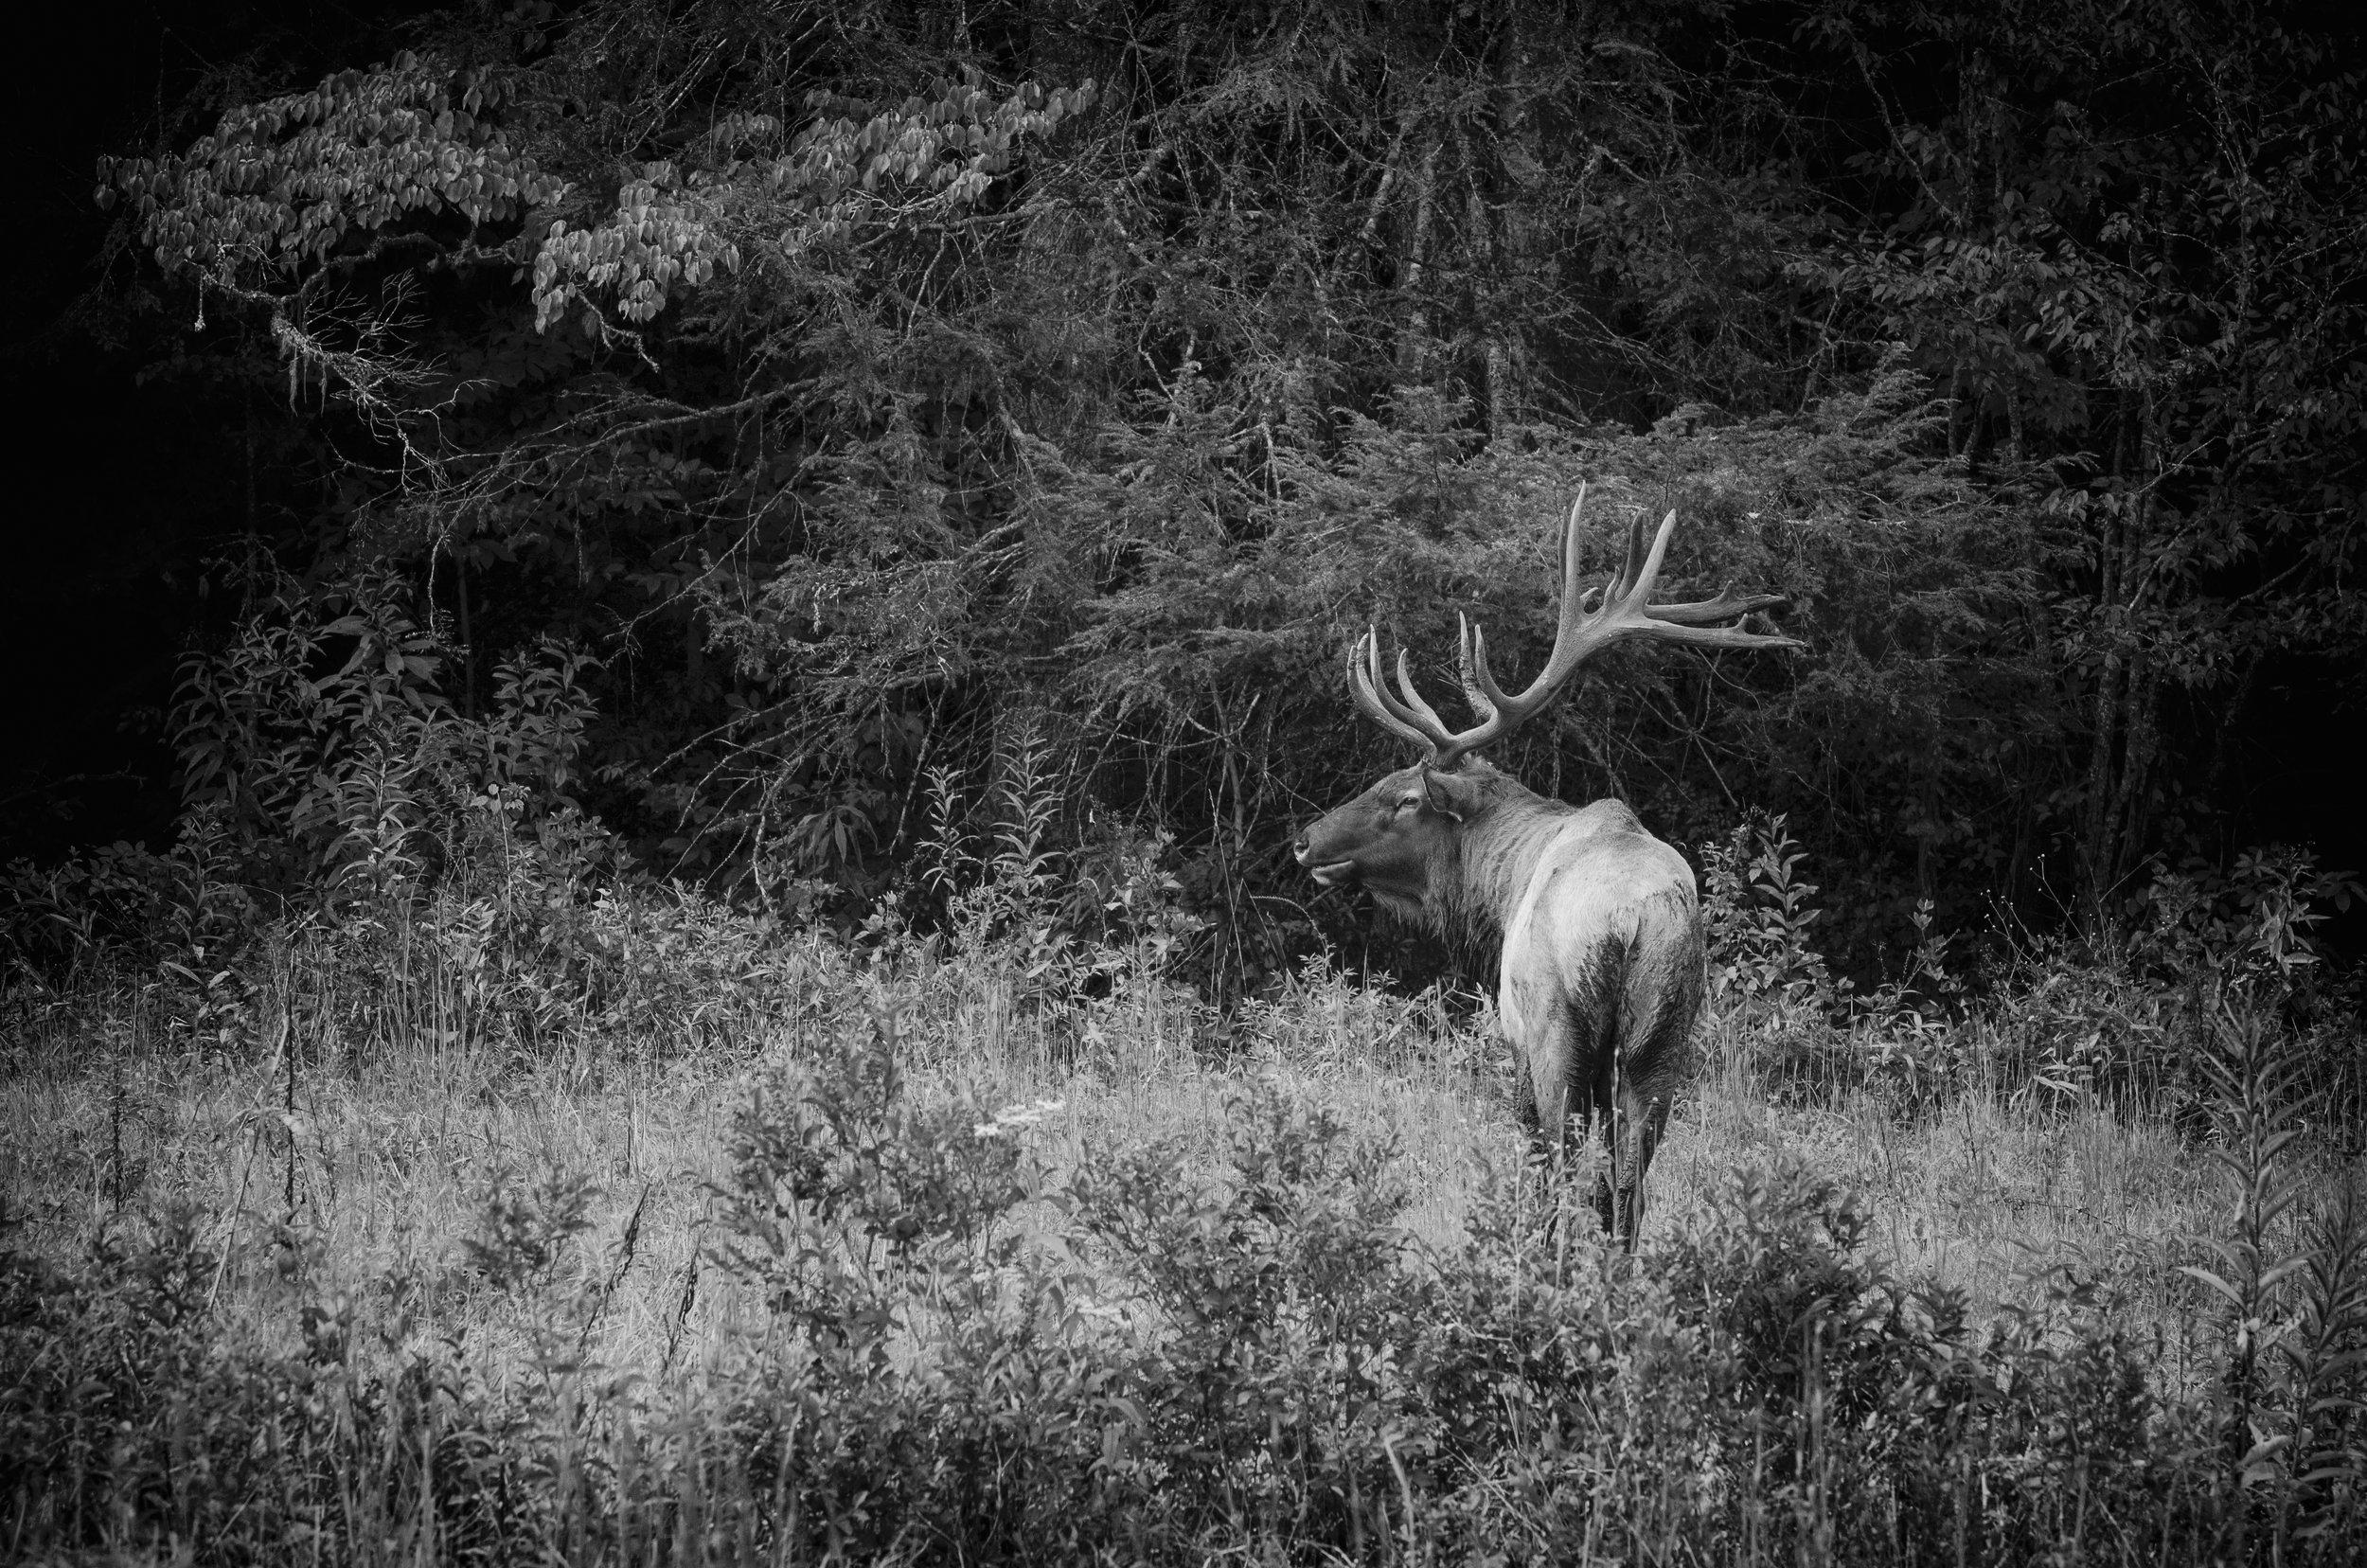 Bull Elk, Cataloochee Valley, Great Smoky Mountains